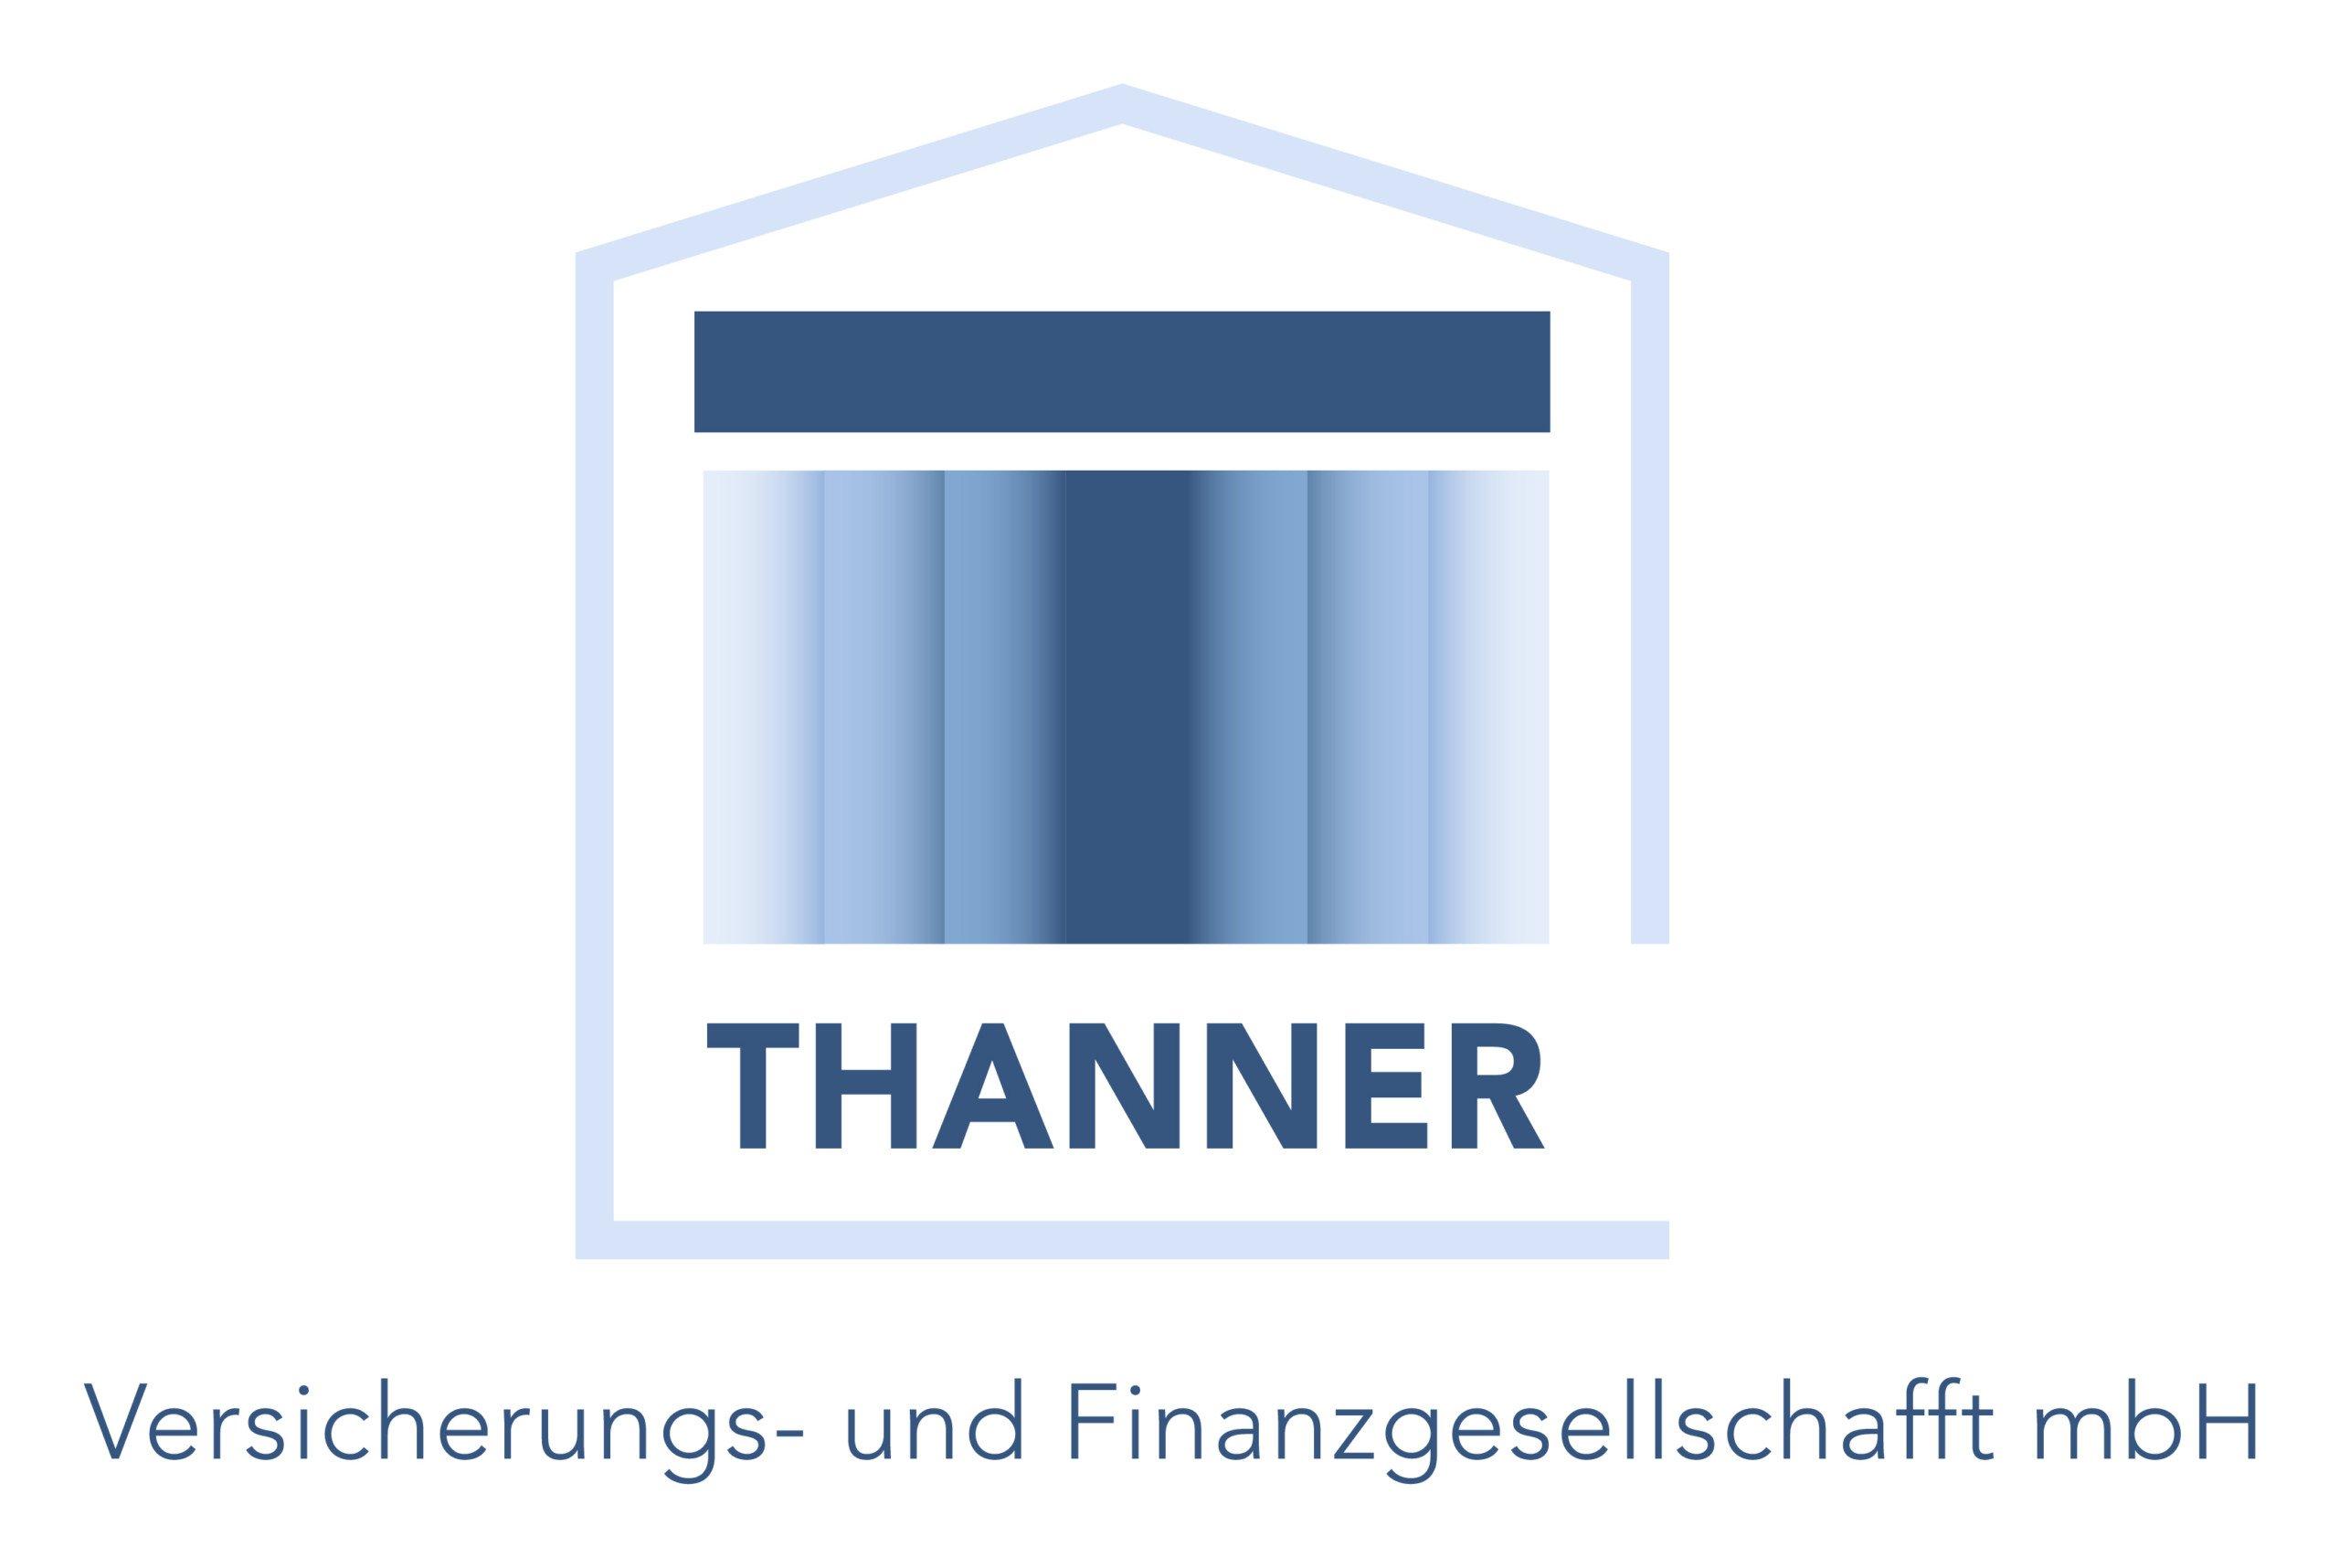 Thanner – VM